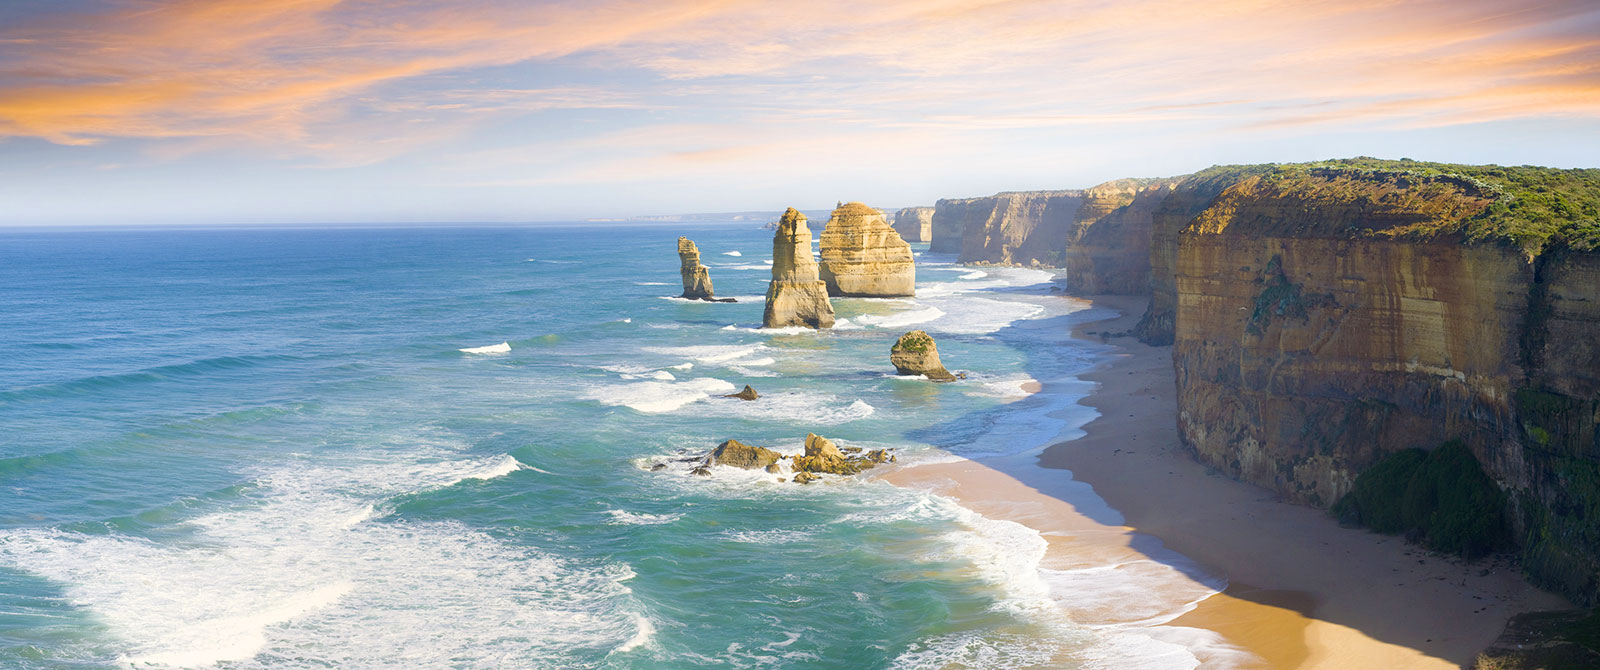 Great Ocean Road Tour - Australia Vacations - Twelve Apostles Great Ocean Road